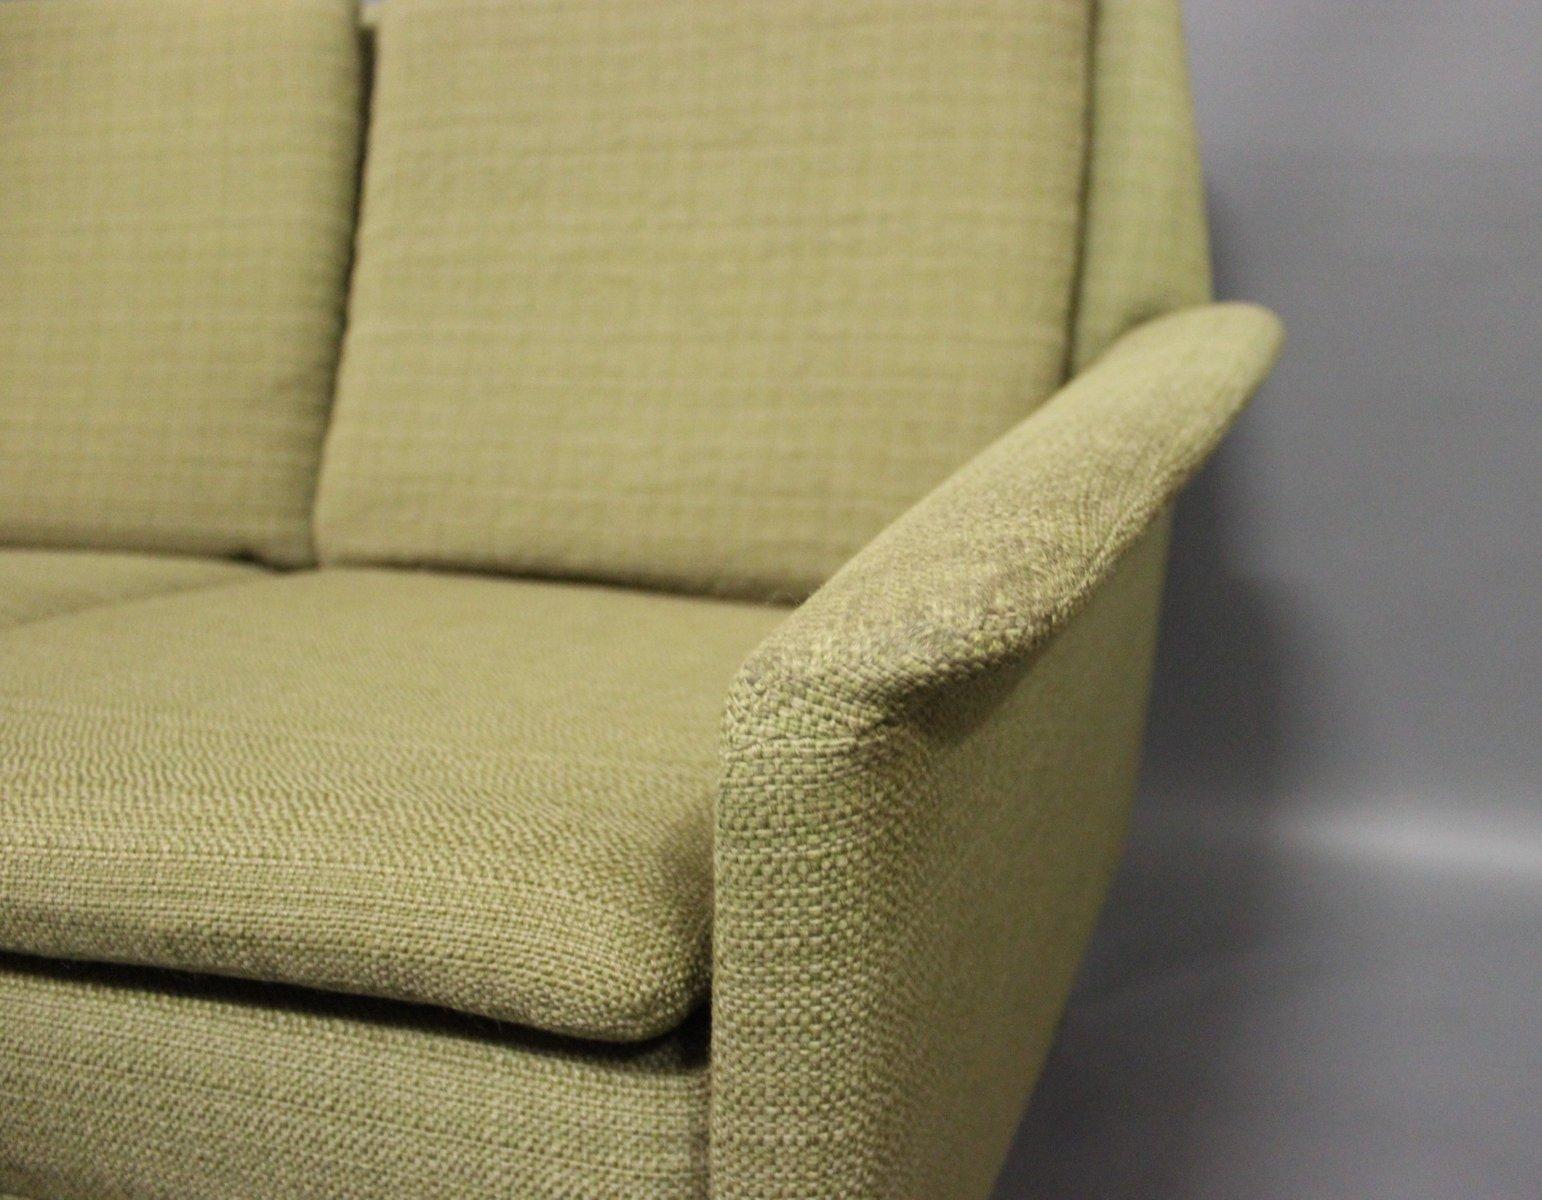 dux sofa by folke ohlsson cama usado costa rica 3 seater for fritz hansen 1960s